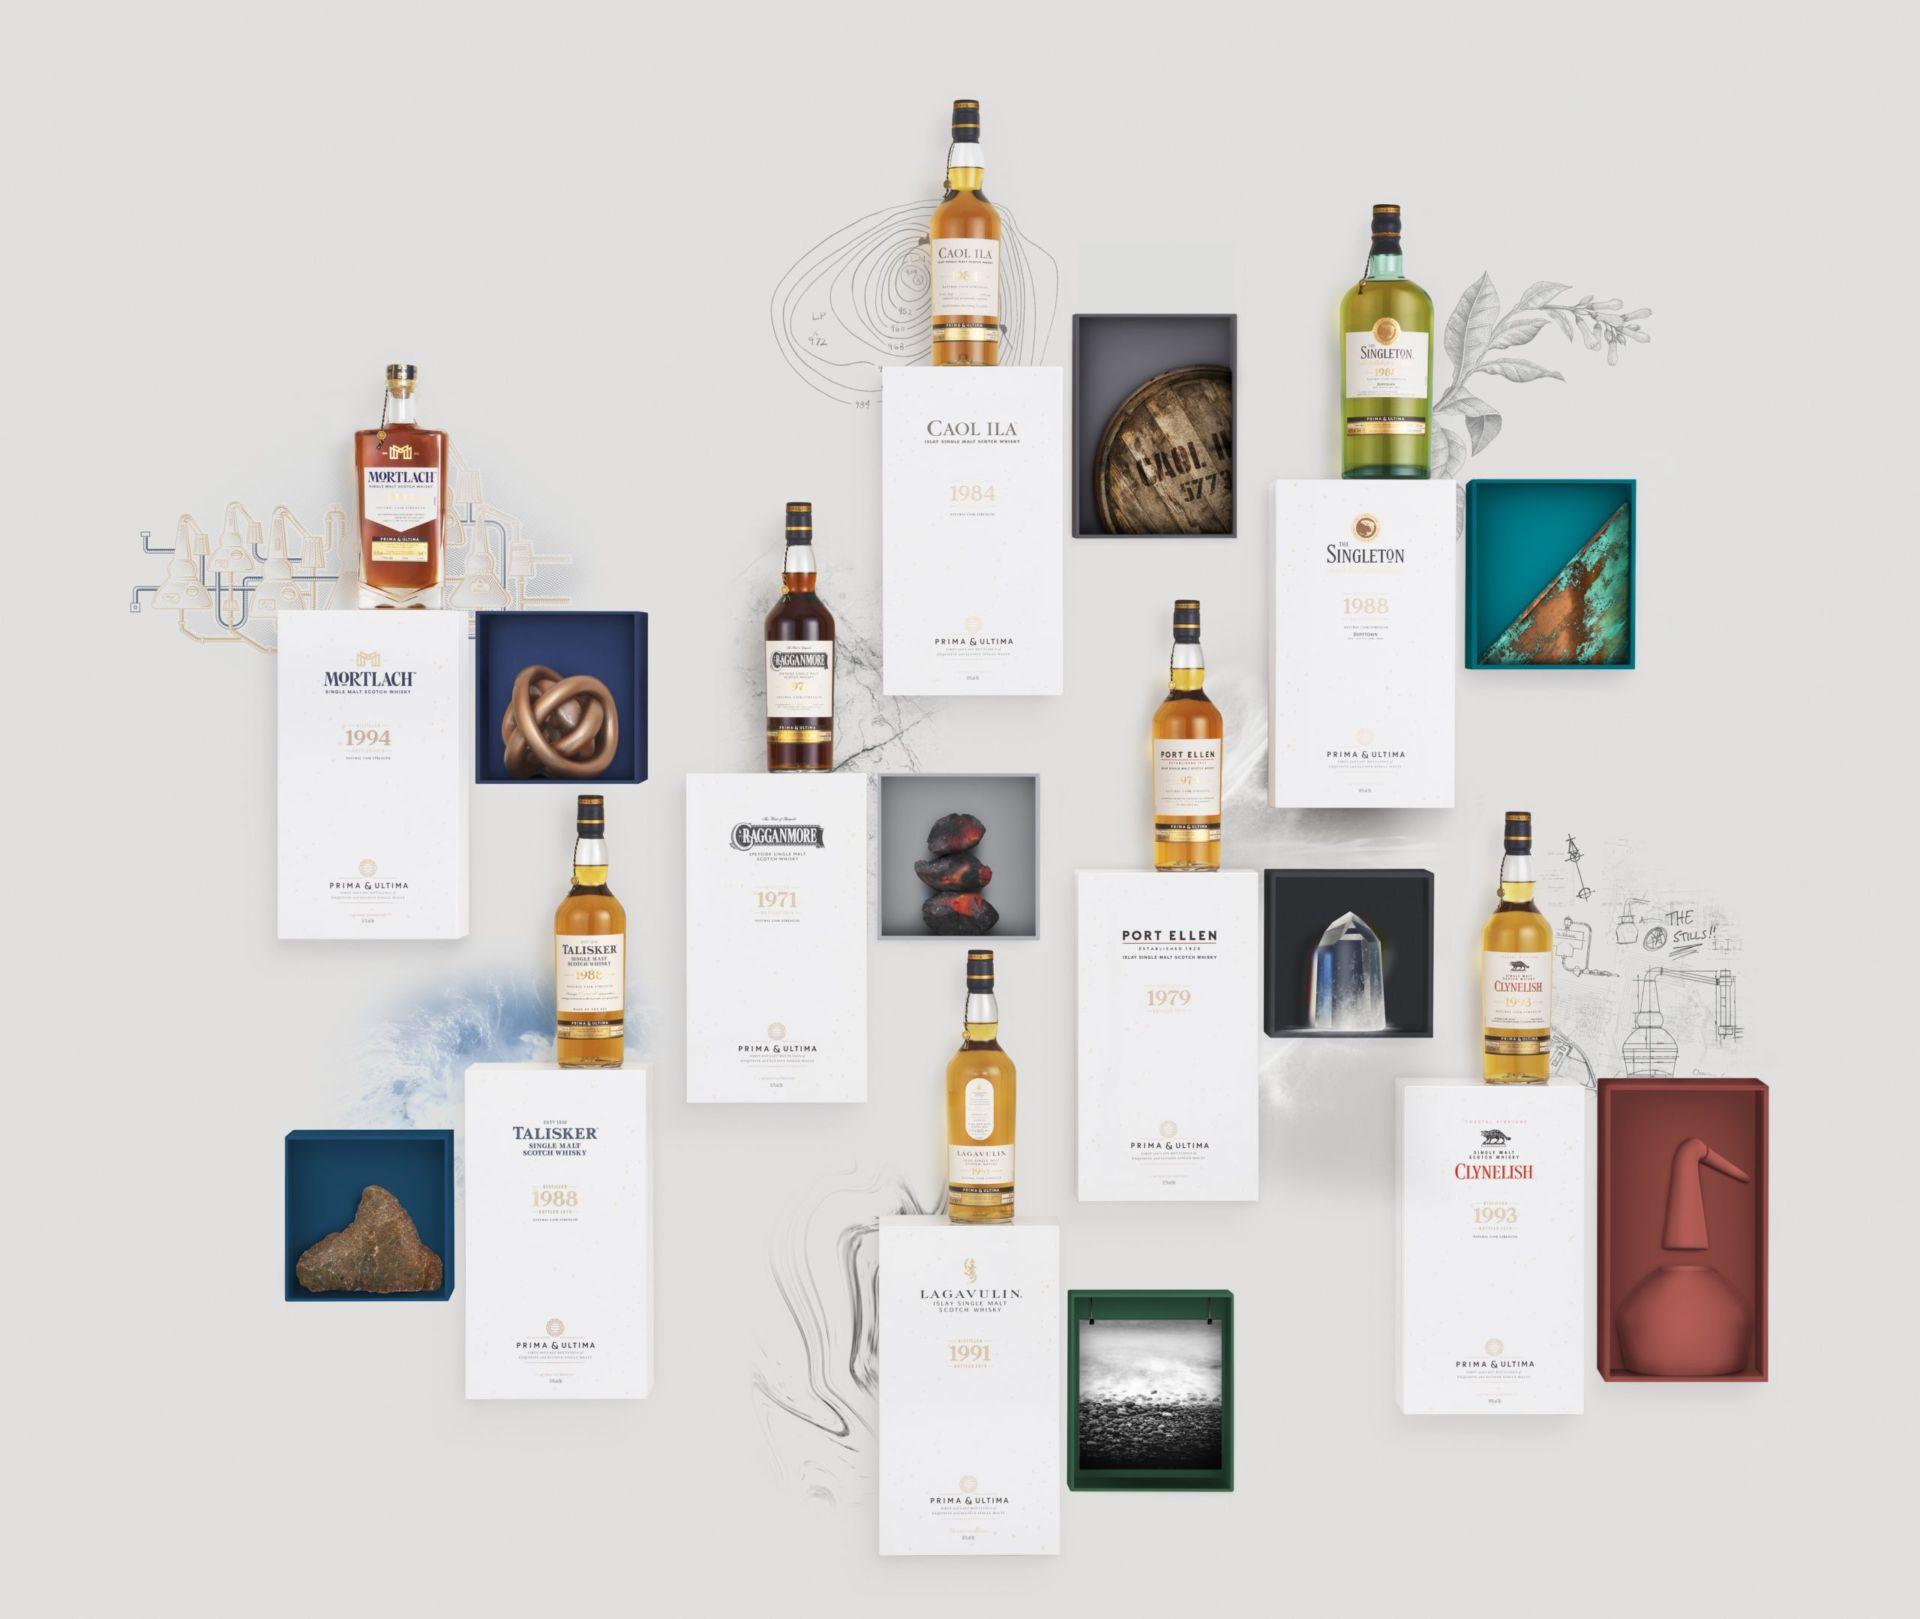 Prima & Ultima whisky ranges